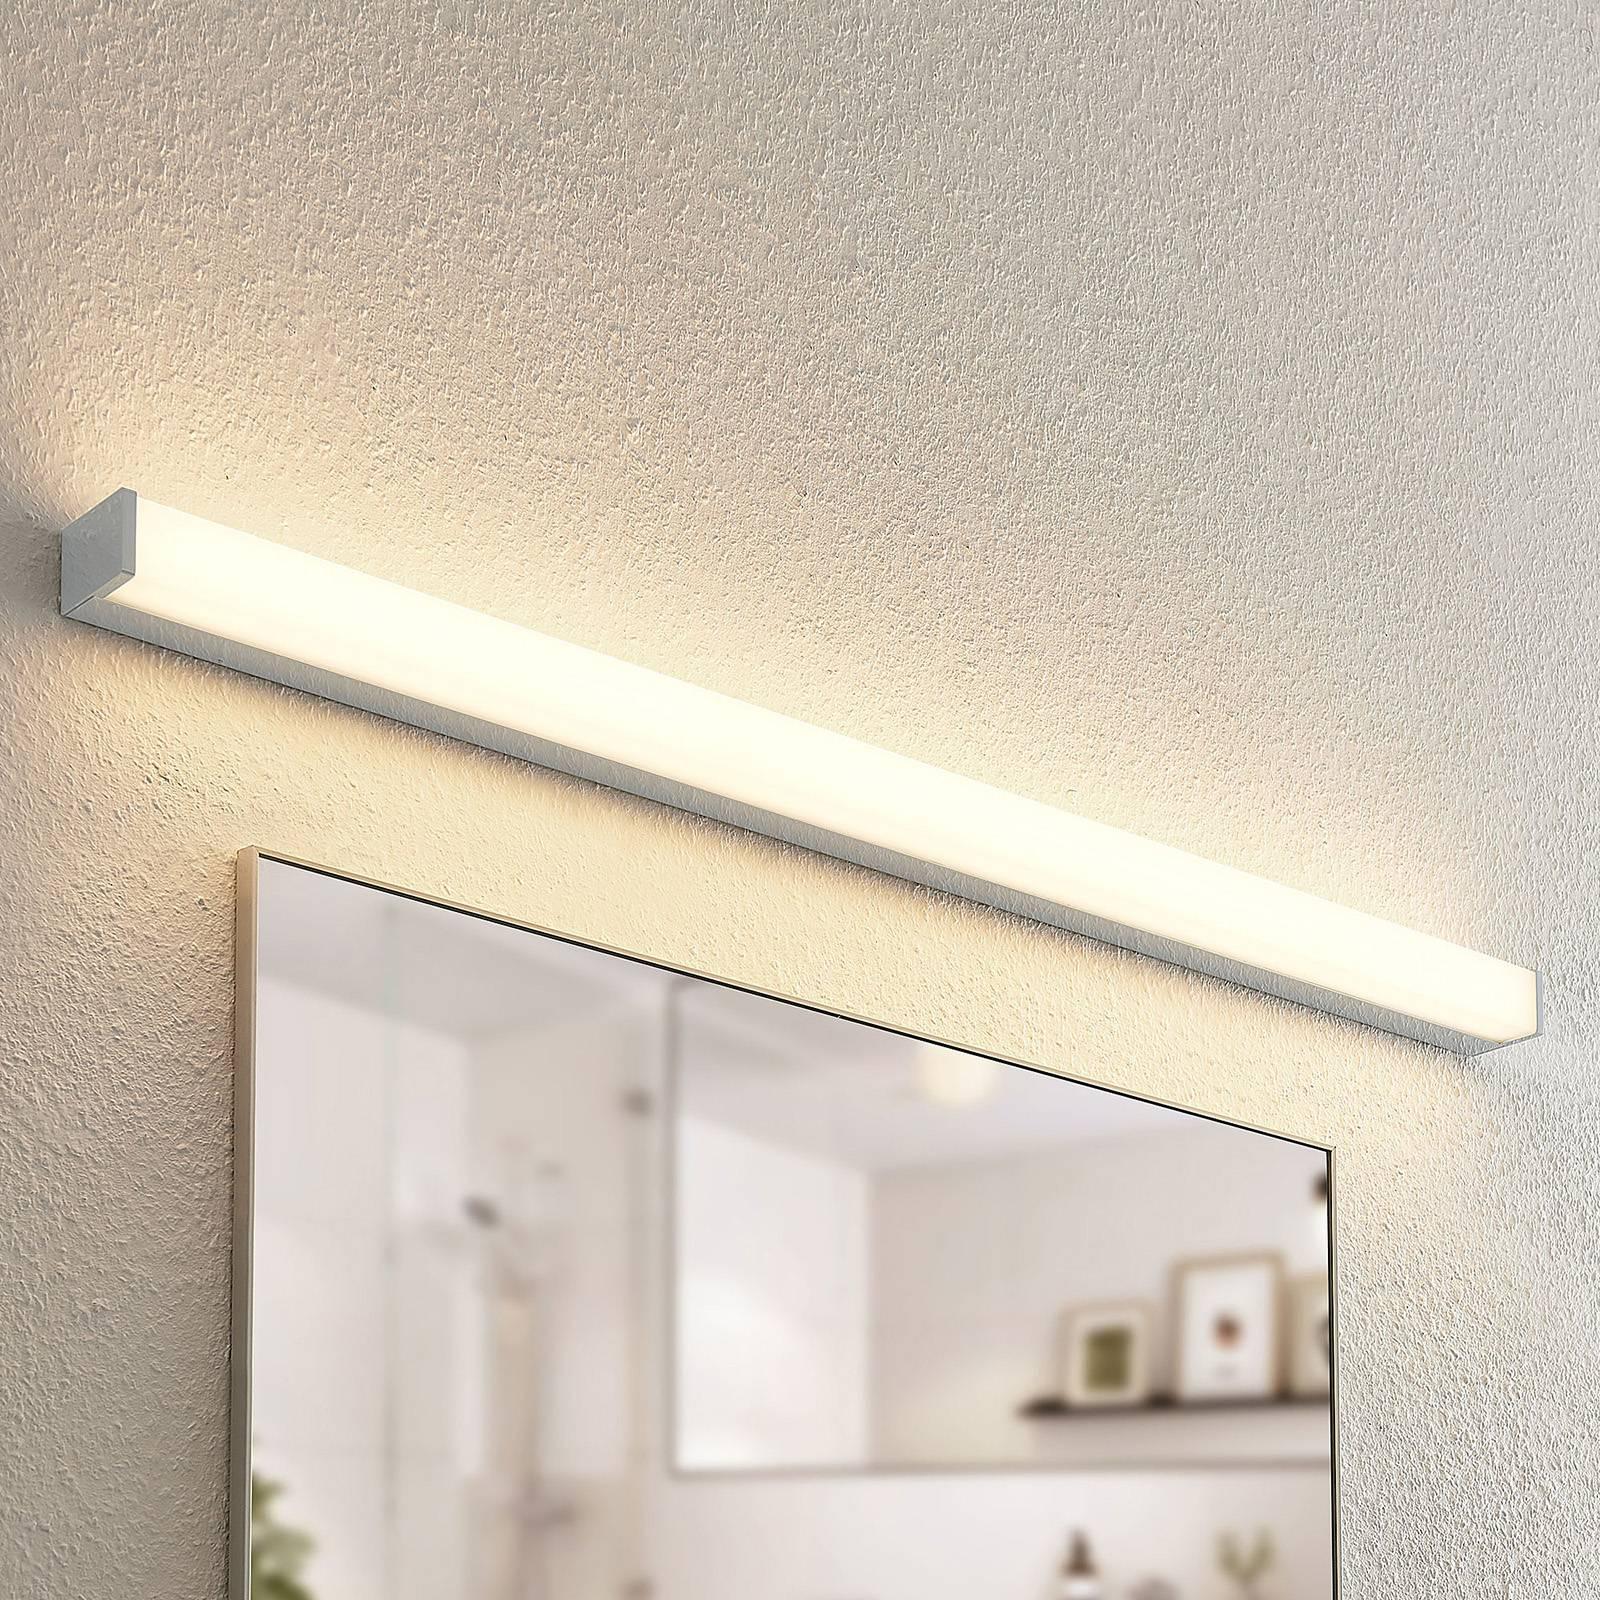 Lindby Klea -LED-kylpyhuonelamppu, 120 cm